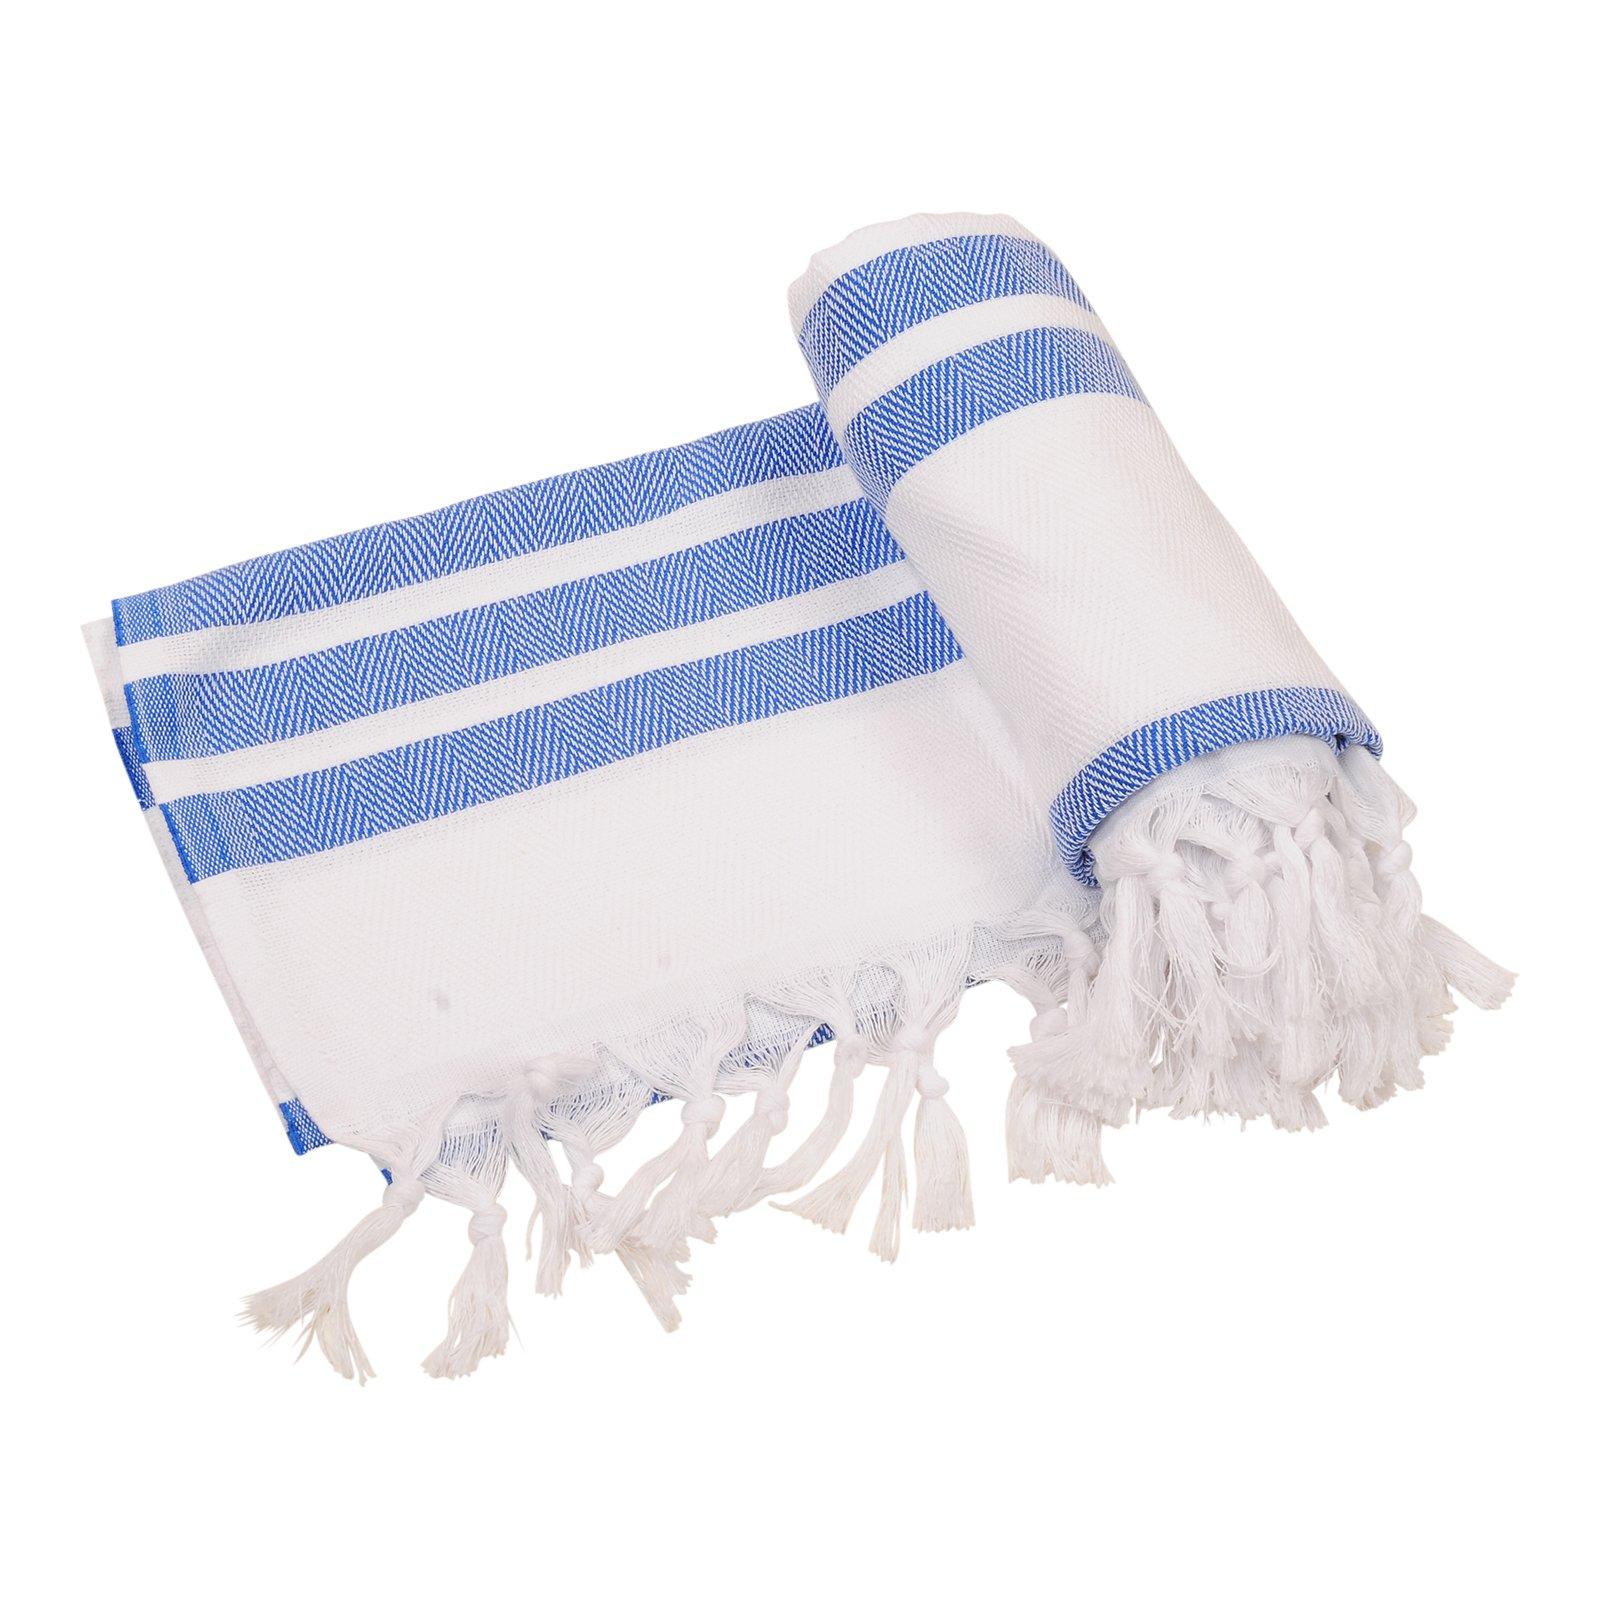 Herringbone Turkish Towel Beach Towel Bath Towel Peshtemal Fouta Spa Sauna Travel Pool Gym Yoga Picnic Camping Throw, 100% Cotton 39''x70'' (Royal Blue)